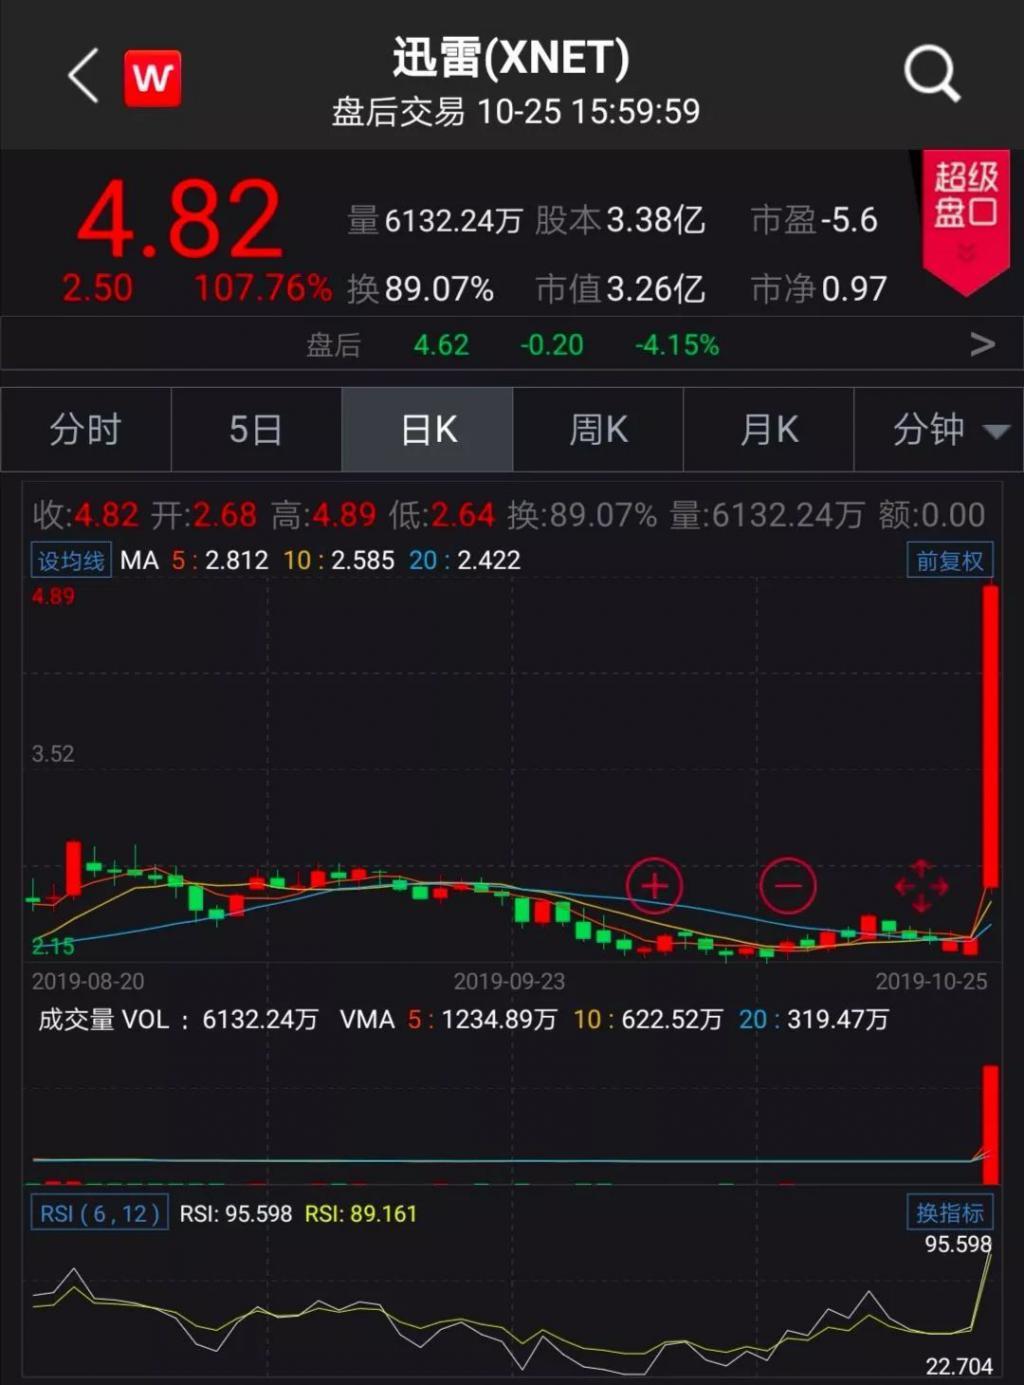 http://www.reviewcode.cn/yanfaguanli/86974.html